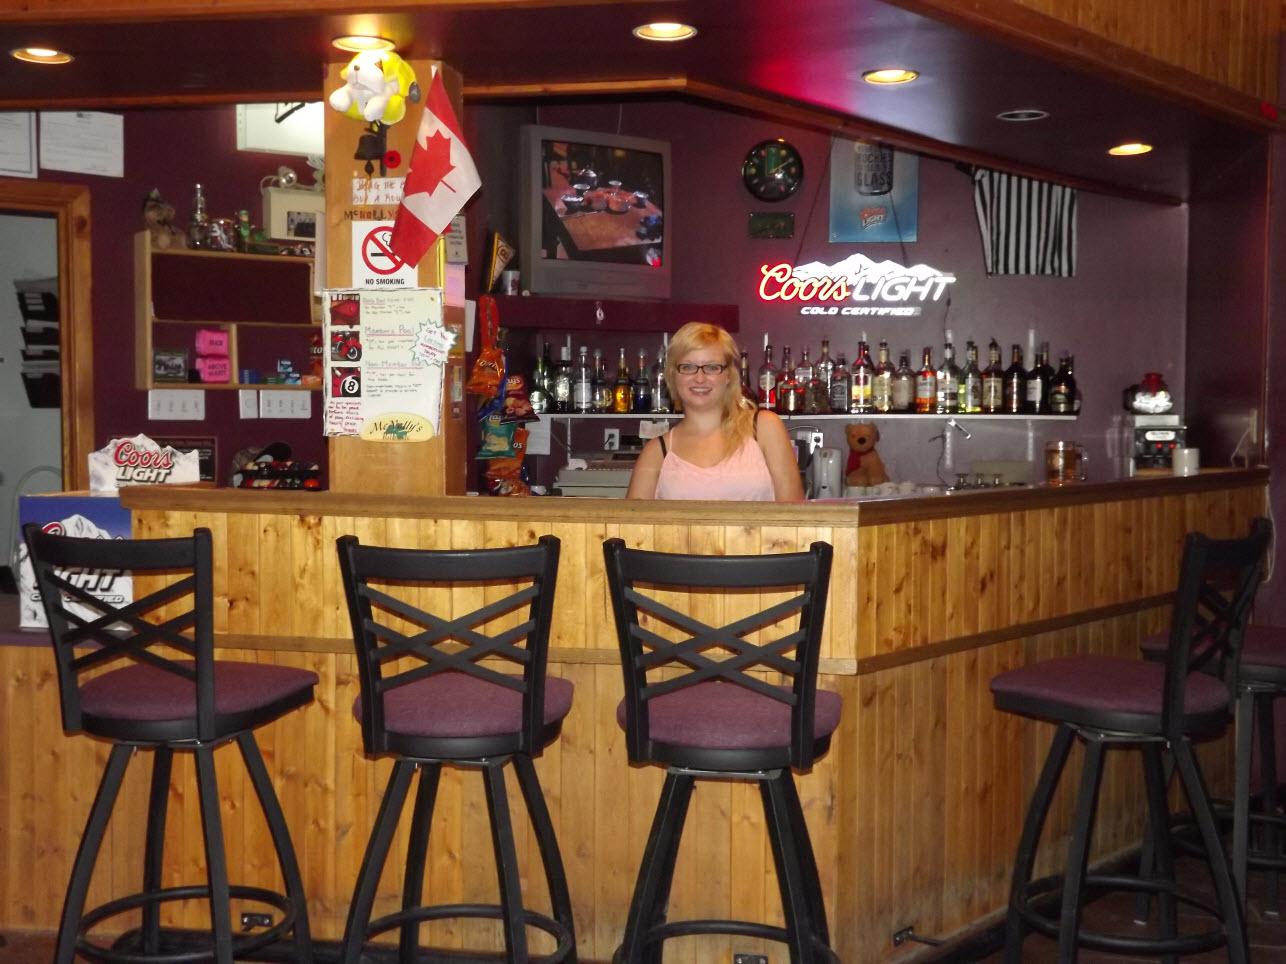 Restaurant Furniture Canada Helps McNallys Billiards in